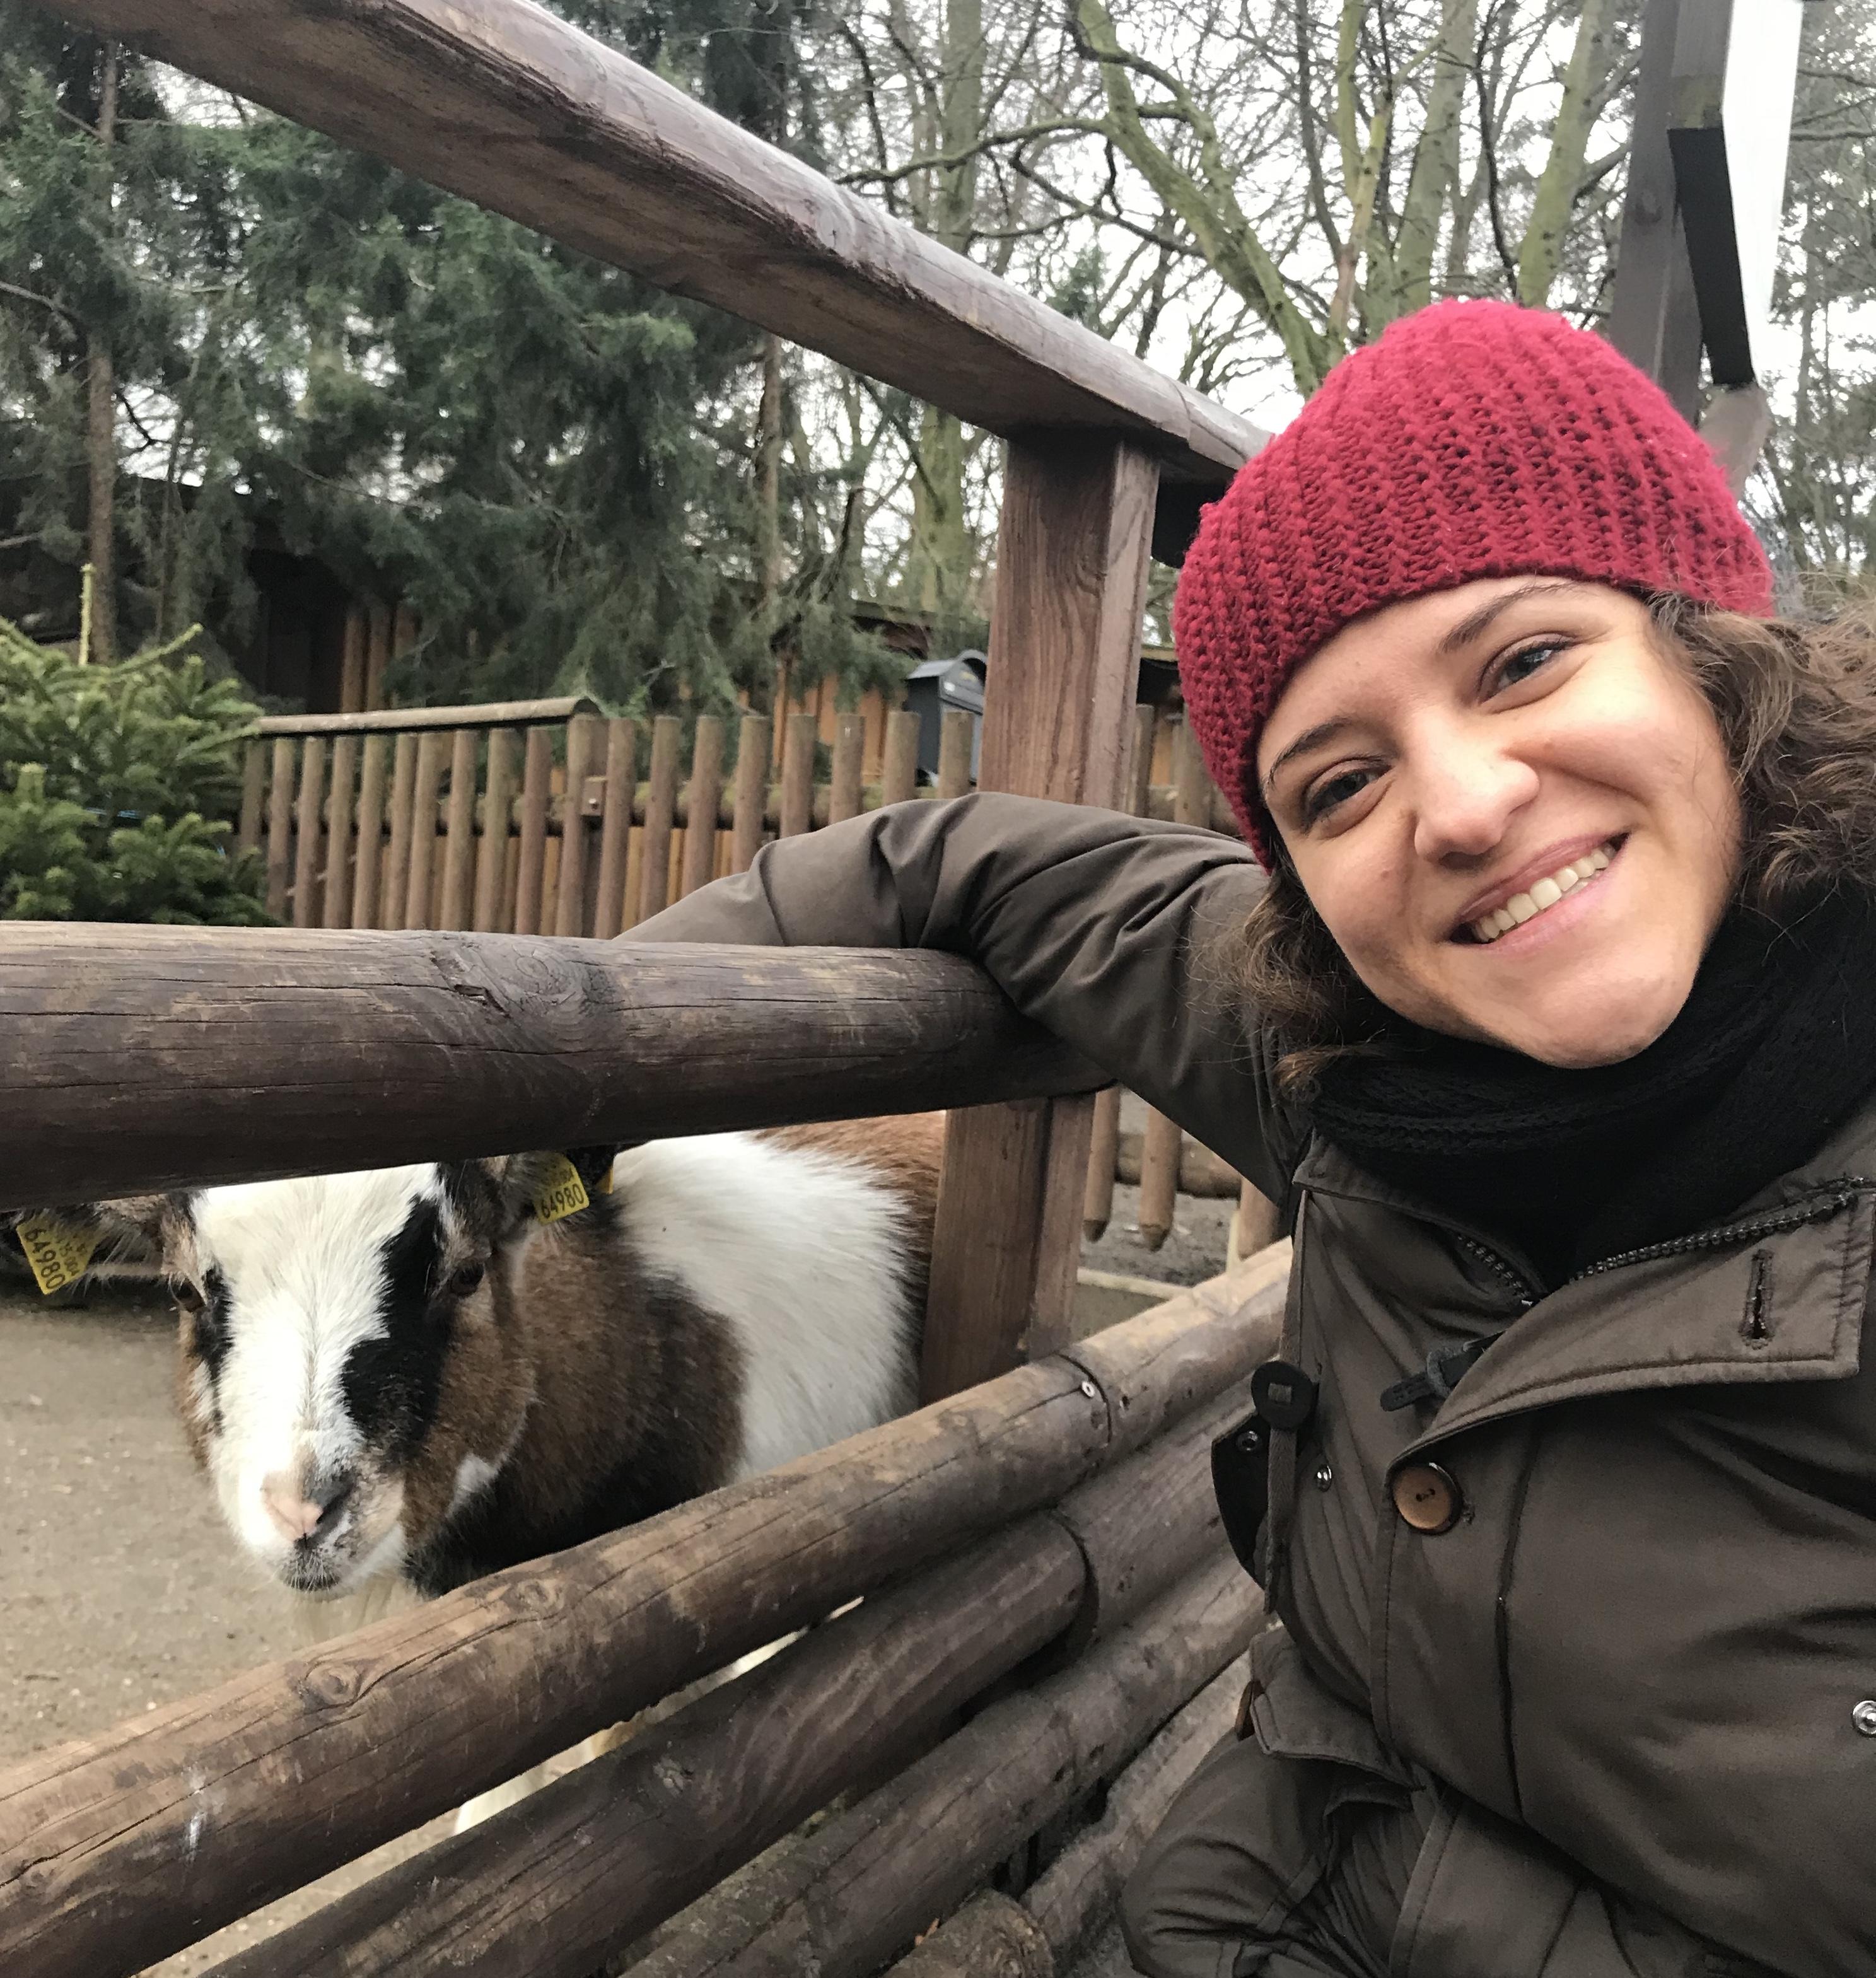 capre-zoo-hasenheide-berlino